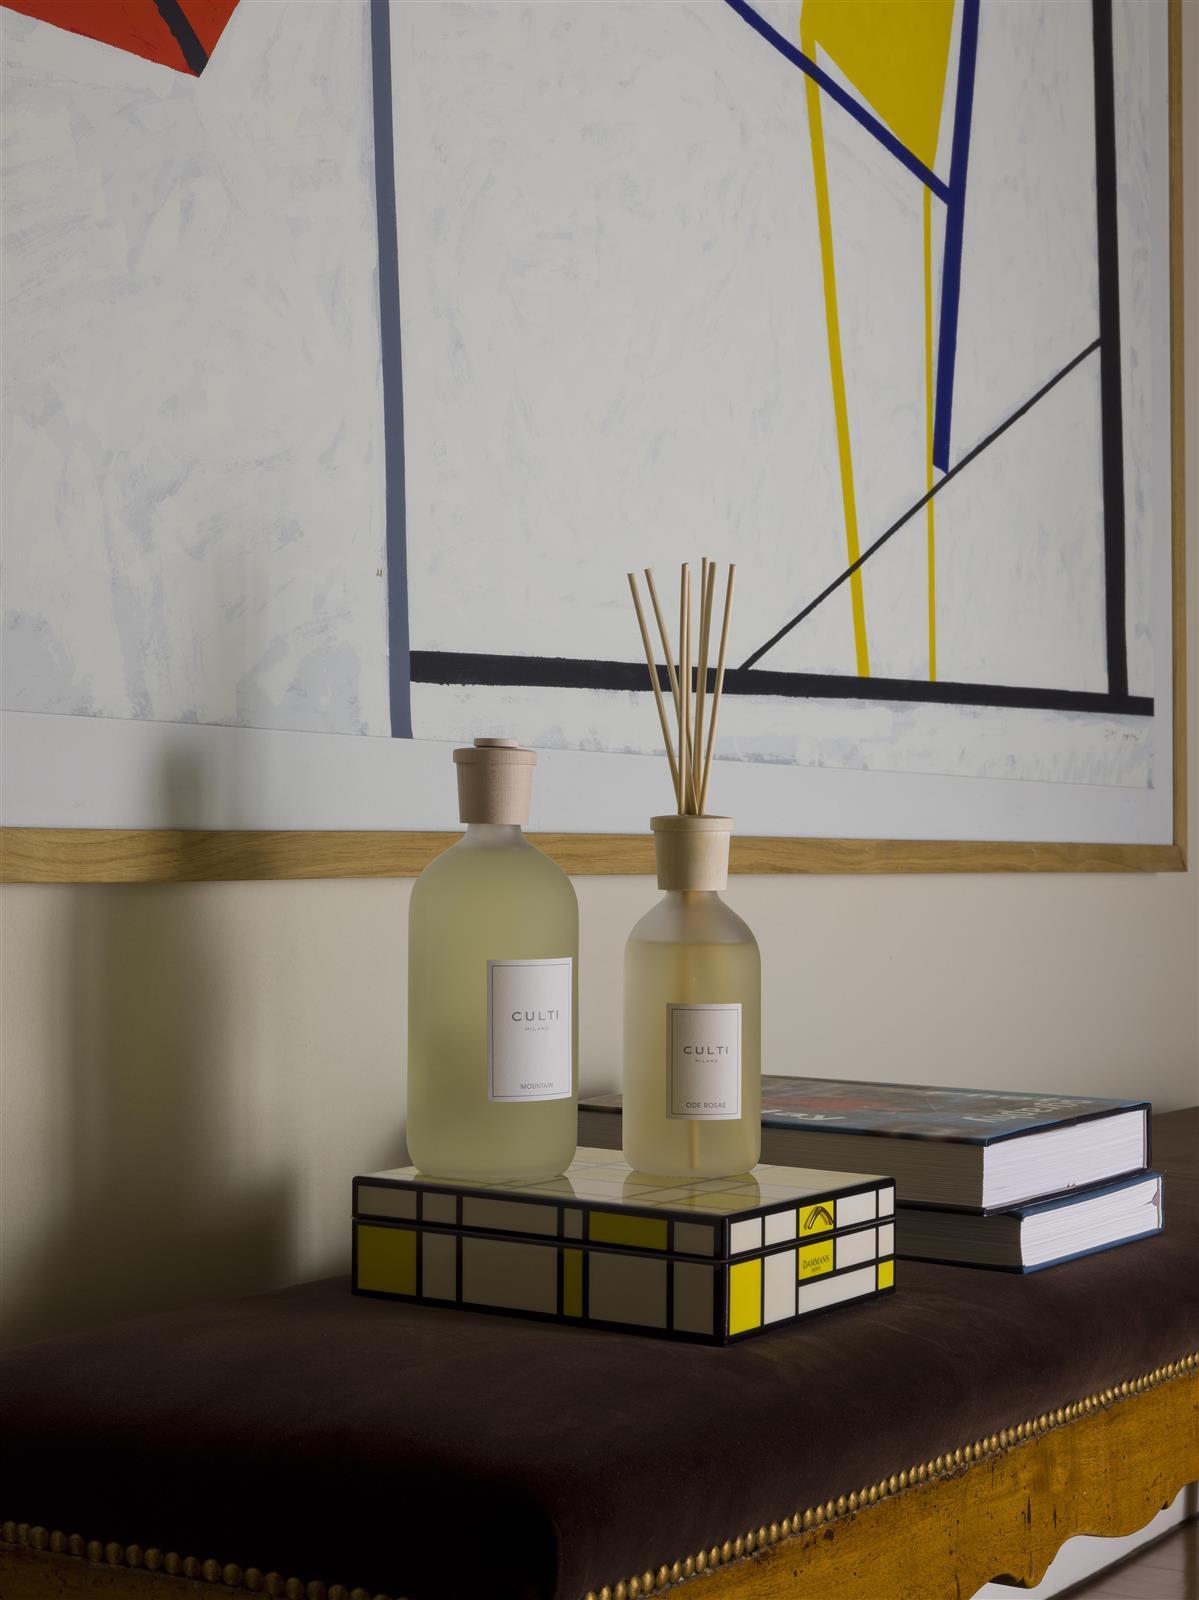 raumduft stile classic diffuser oderosae von culti. Black Bedroom Furniture Sets. Home Design Ideas